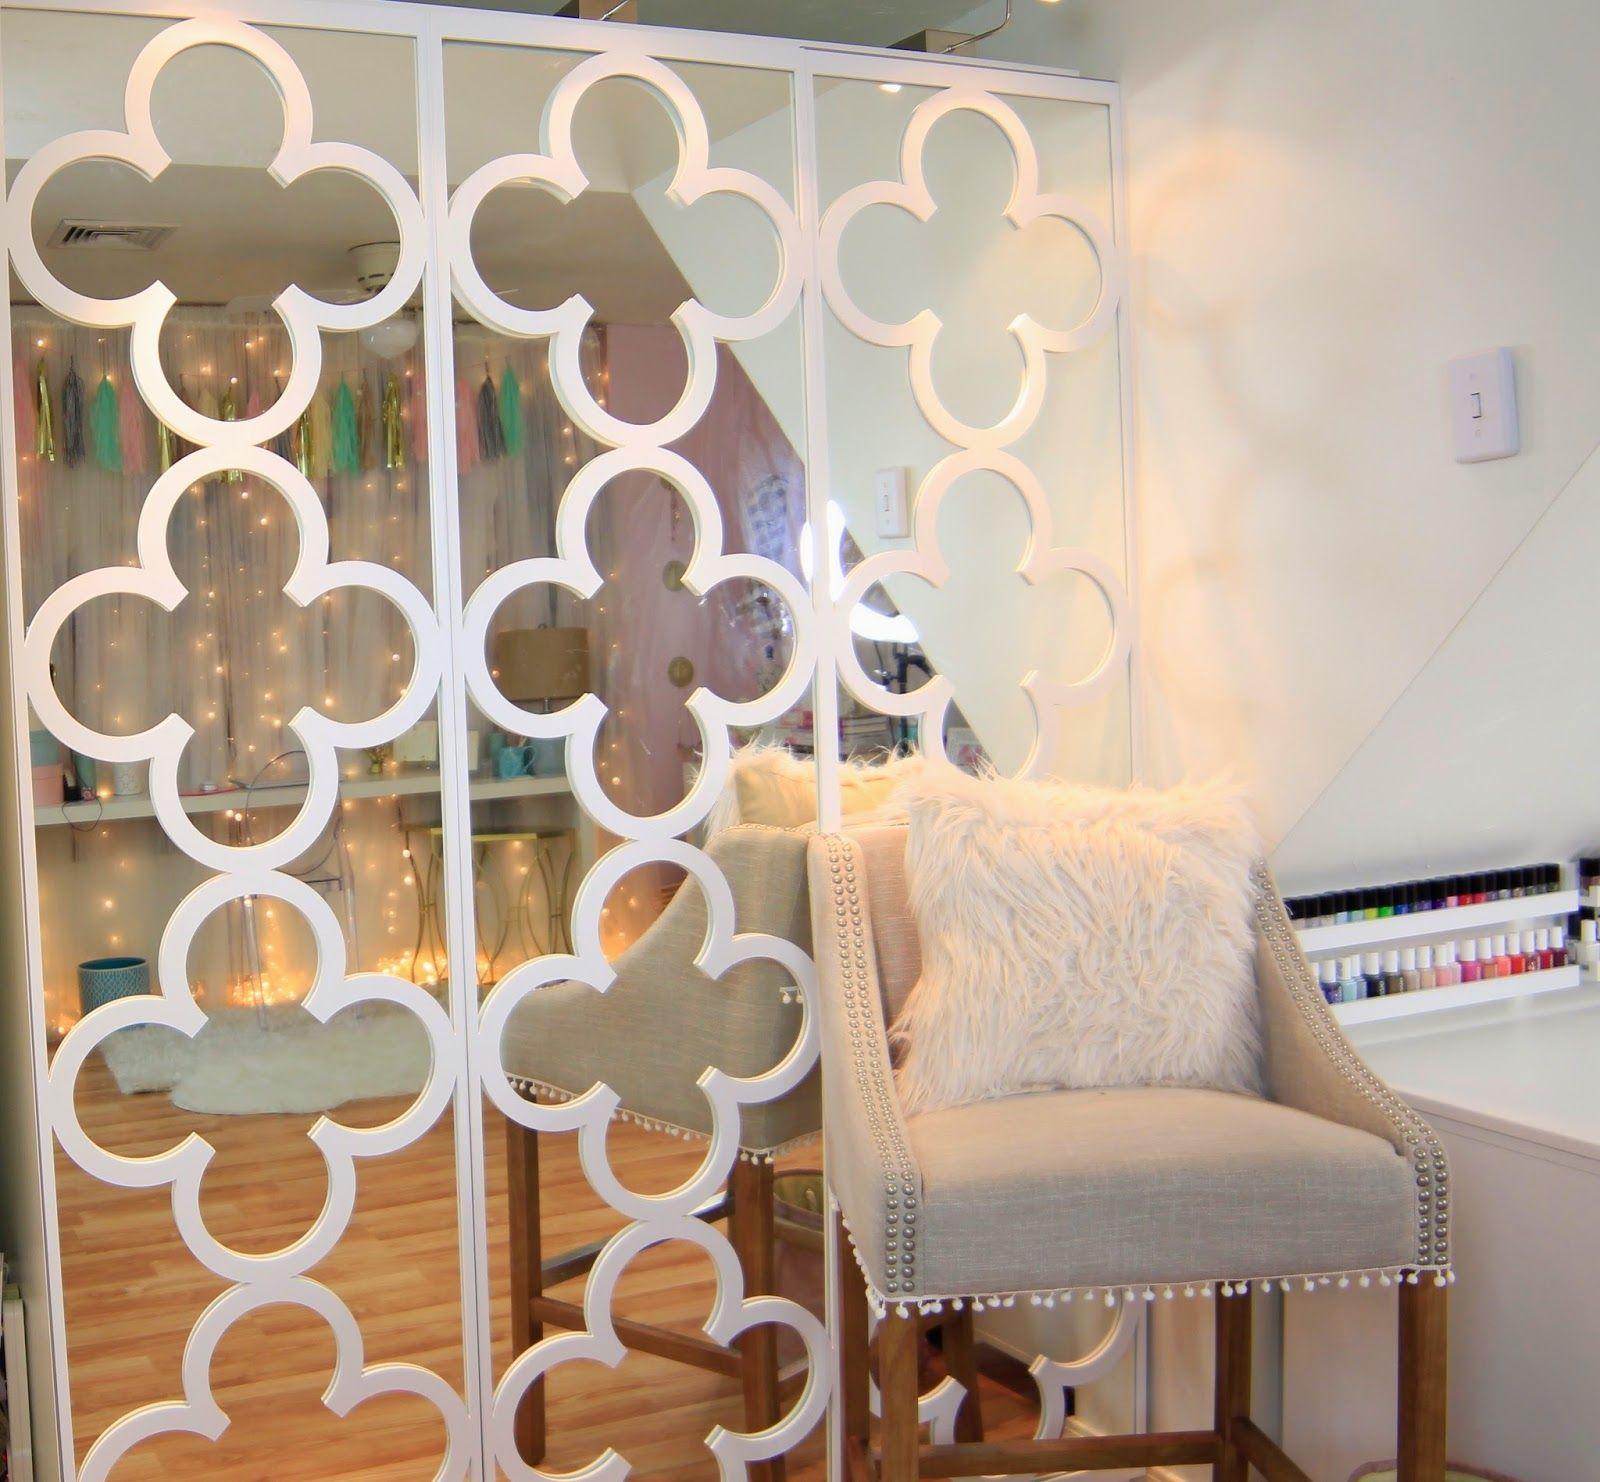 Myoverlays Furniture Update Full View Of Lisa Pullano's